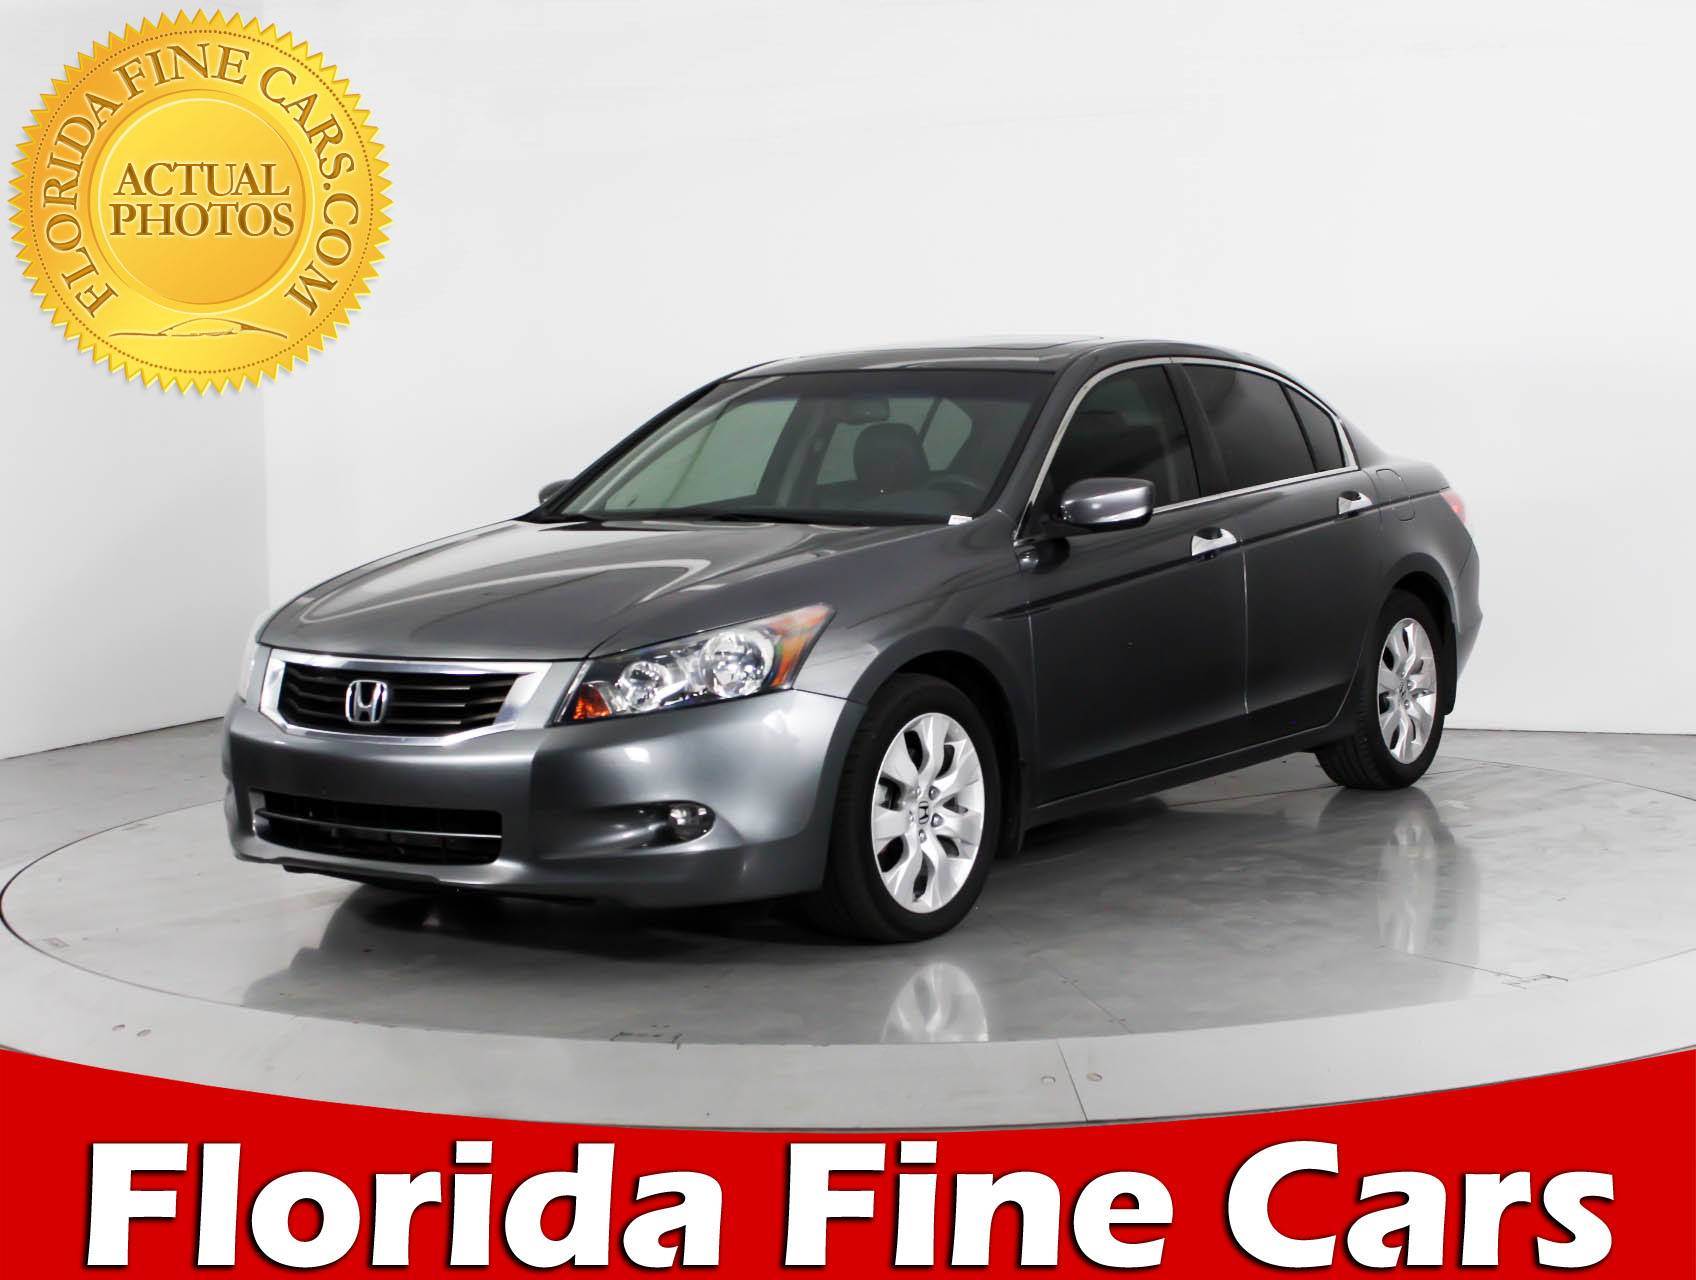 Used 2010 HONDA ACCORD EX L Sedan For Sale In WEST PALM, FL | 89930 |  Florida Fine Cars